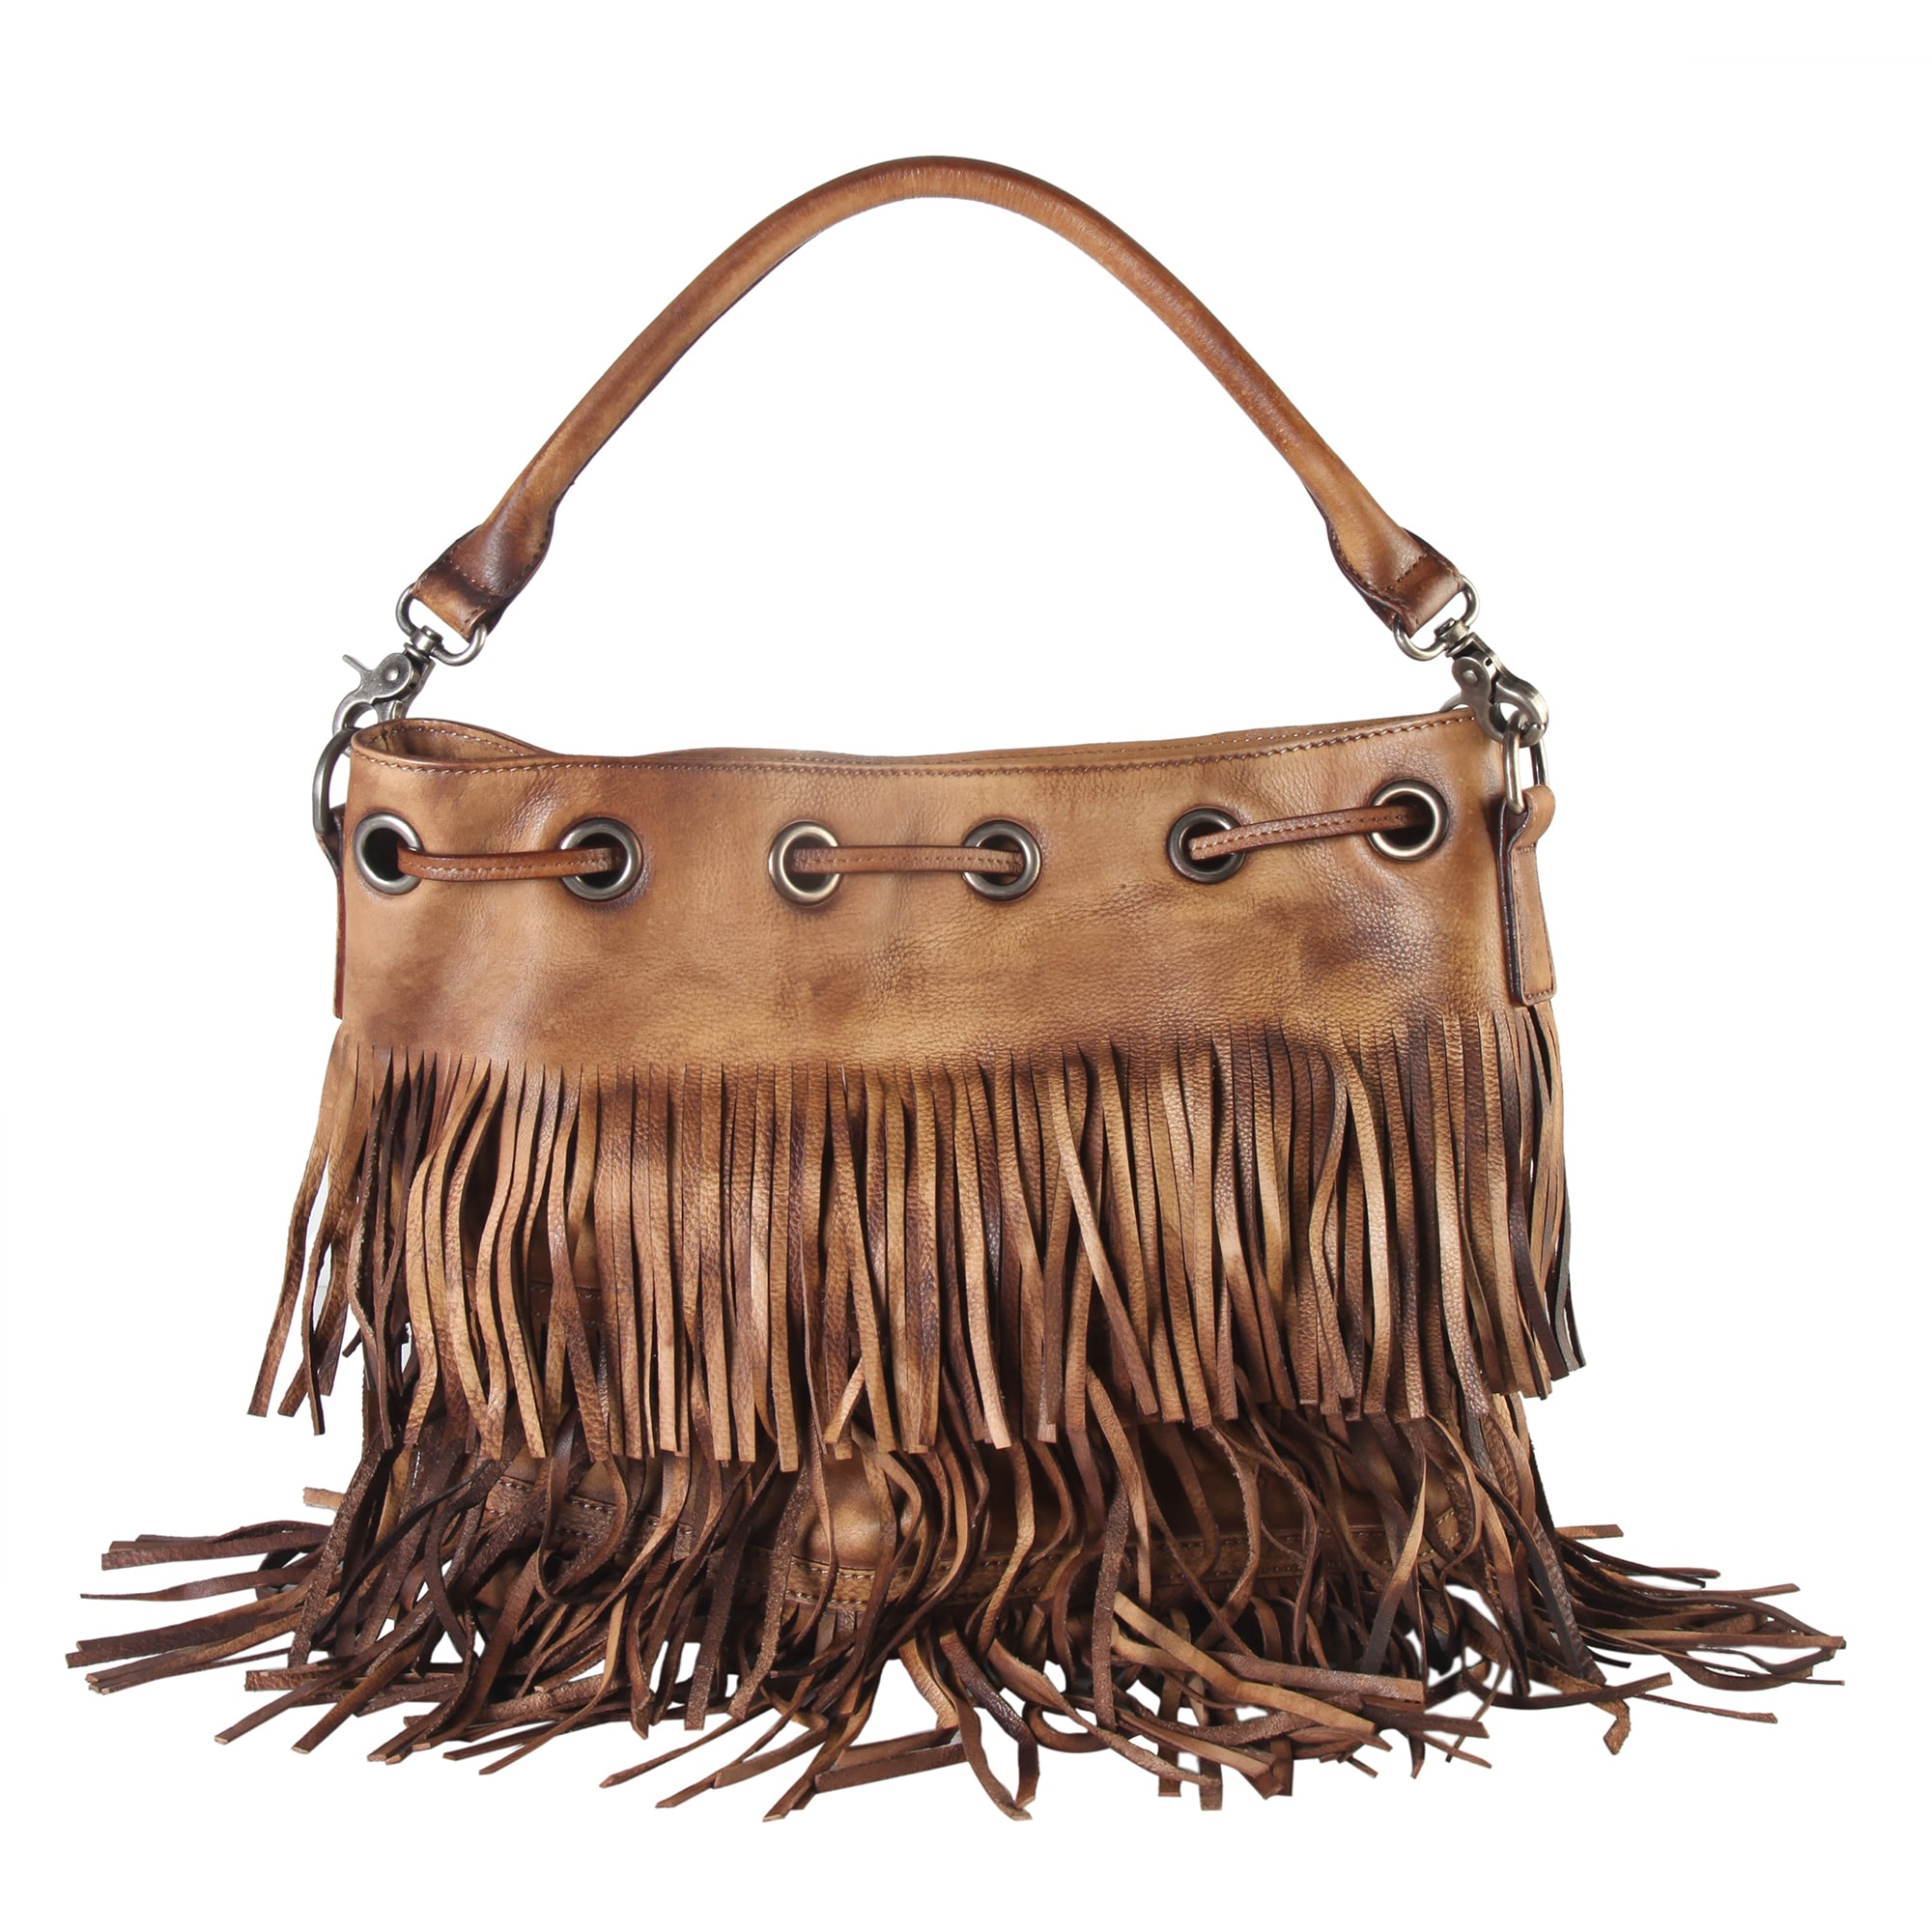 986ea1848261 Diophy Genuine Leather Fringe Style Drawstring Large Tote Bag